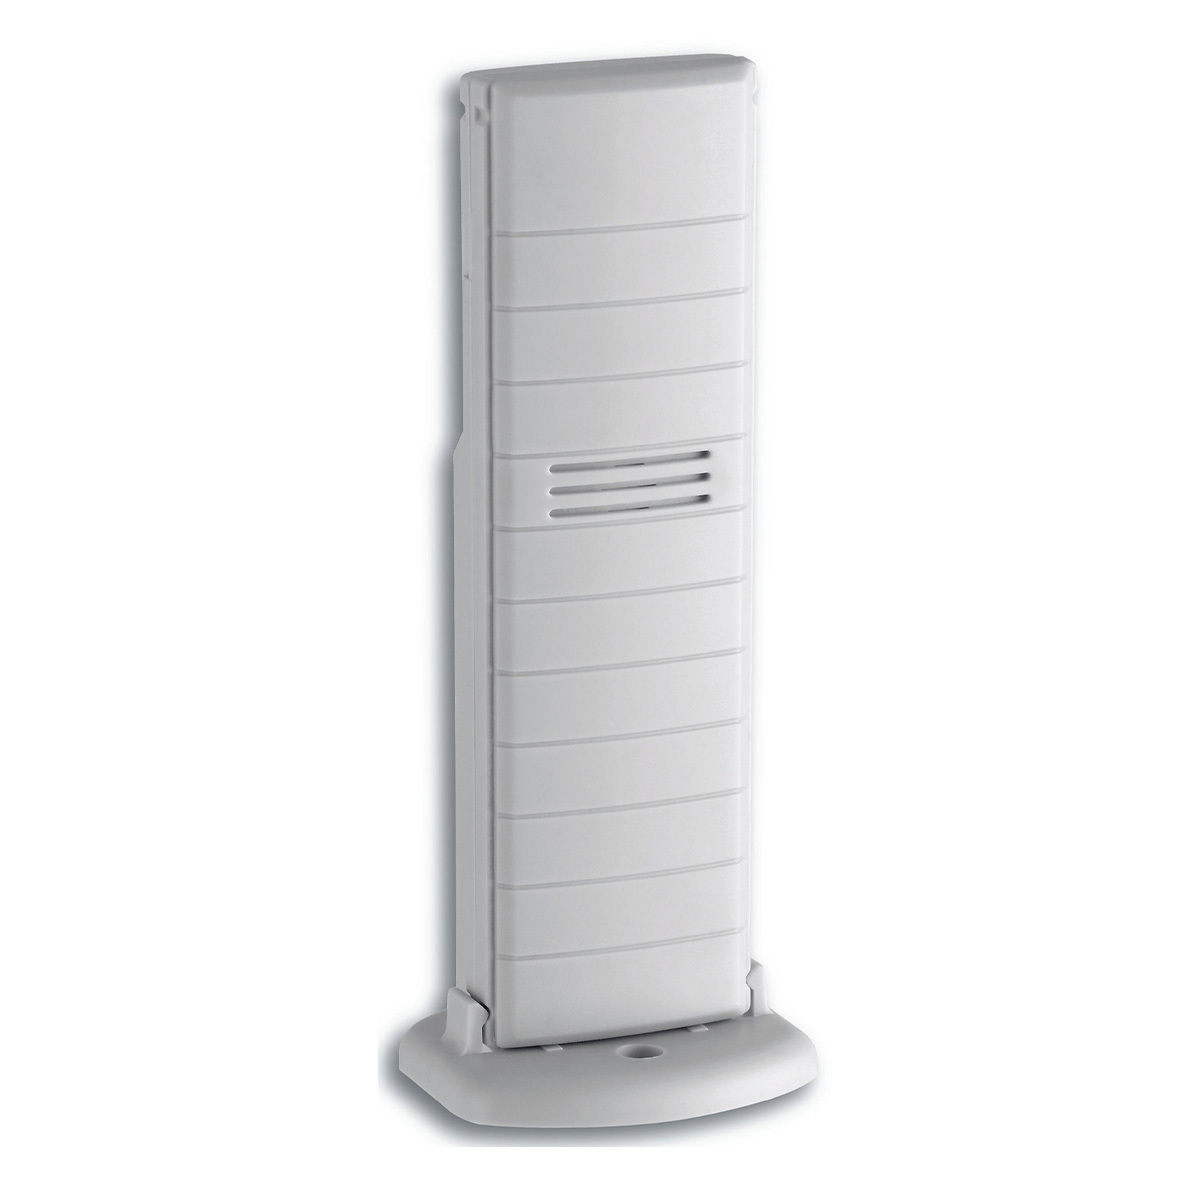 30-3009-54-it-funk-thermometer-logo-sender-1200x1200px.jpg